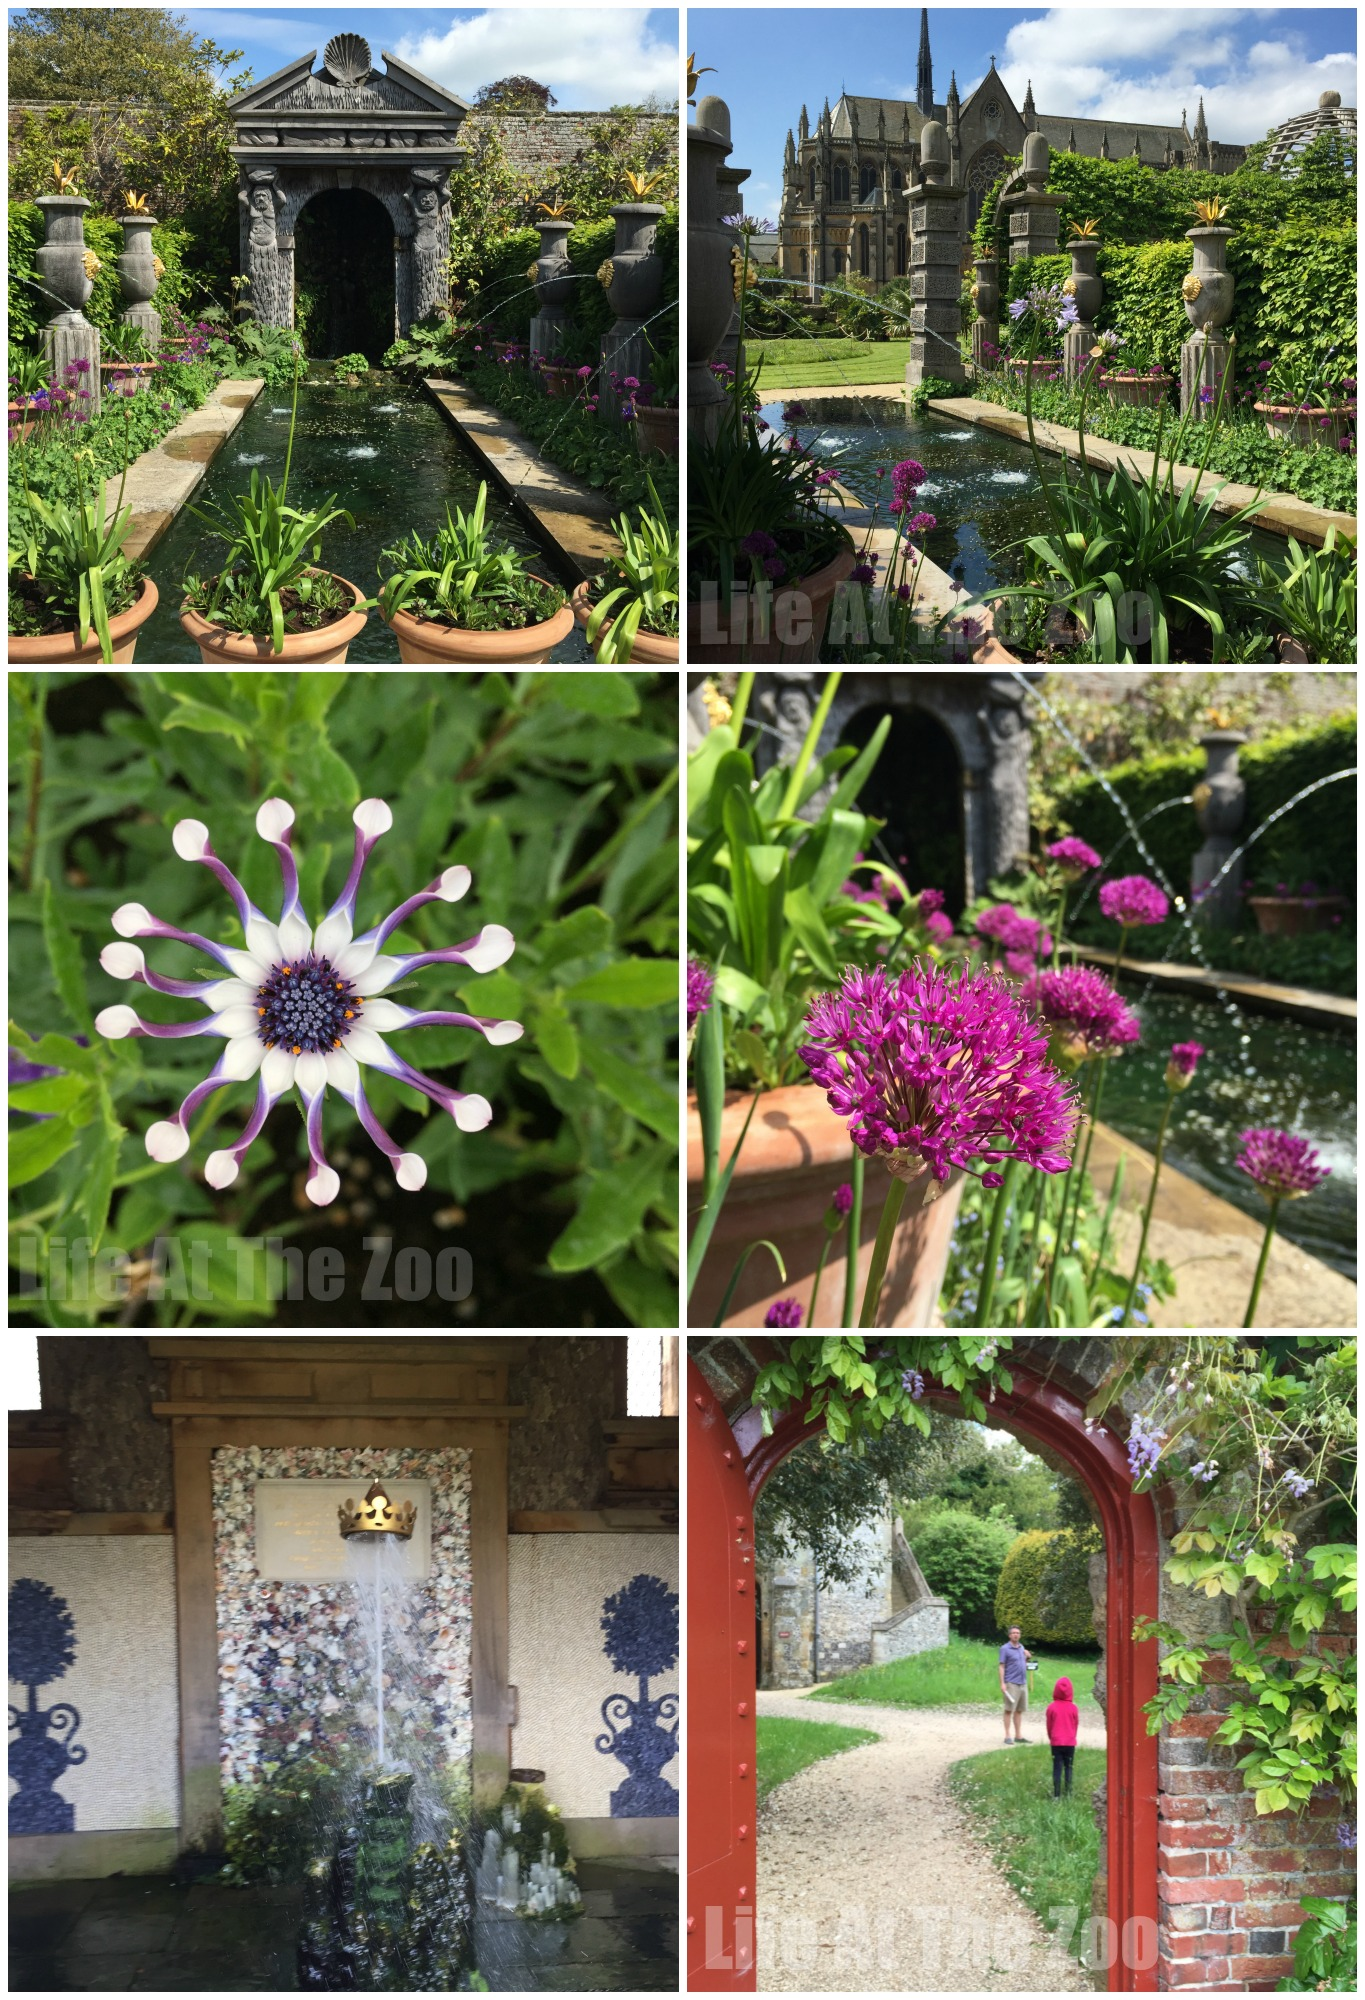 Arundel Castle - the beautiful gardens